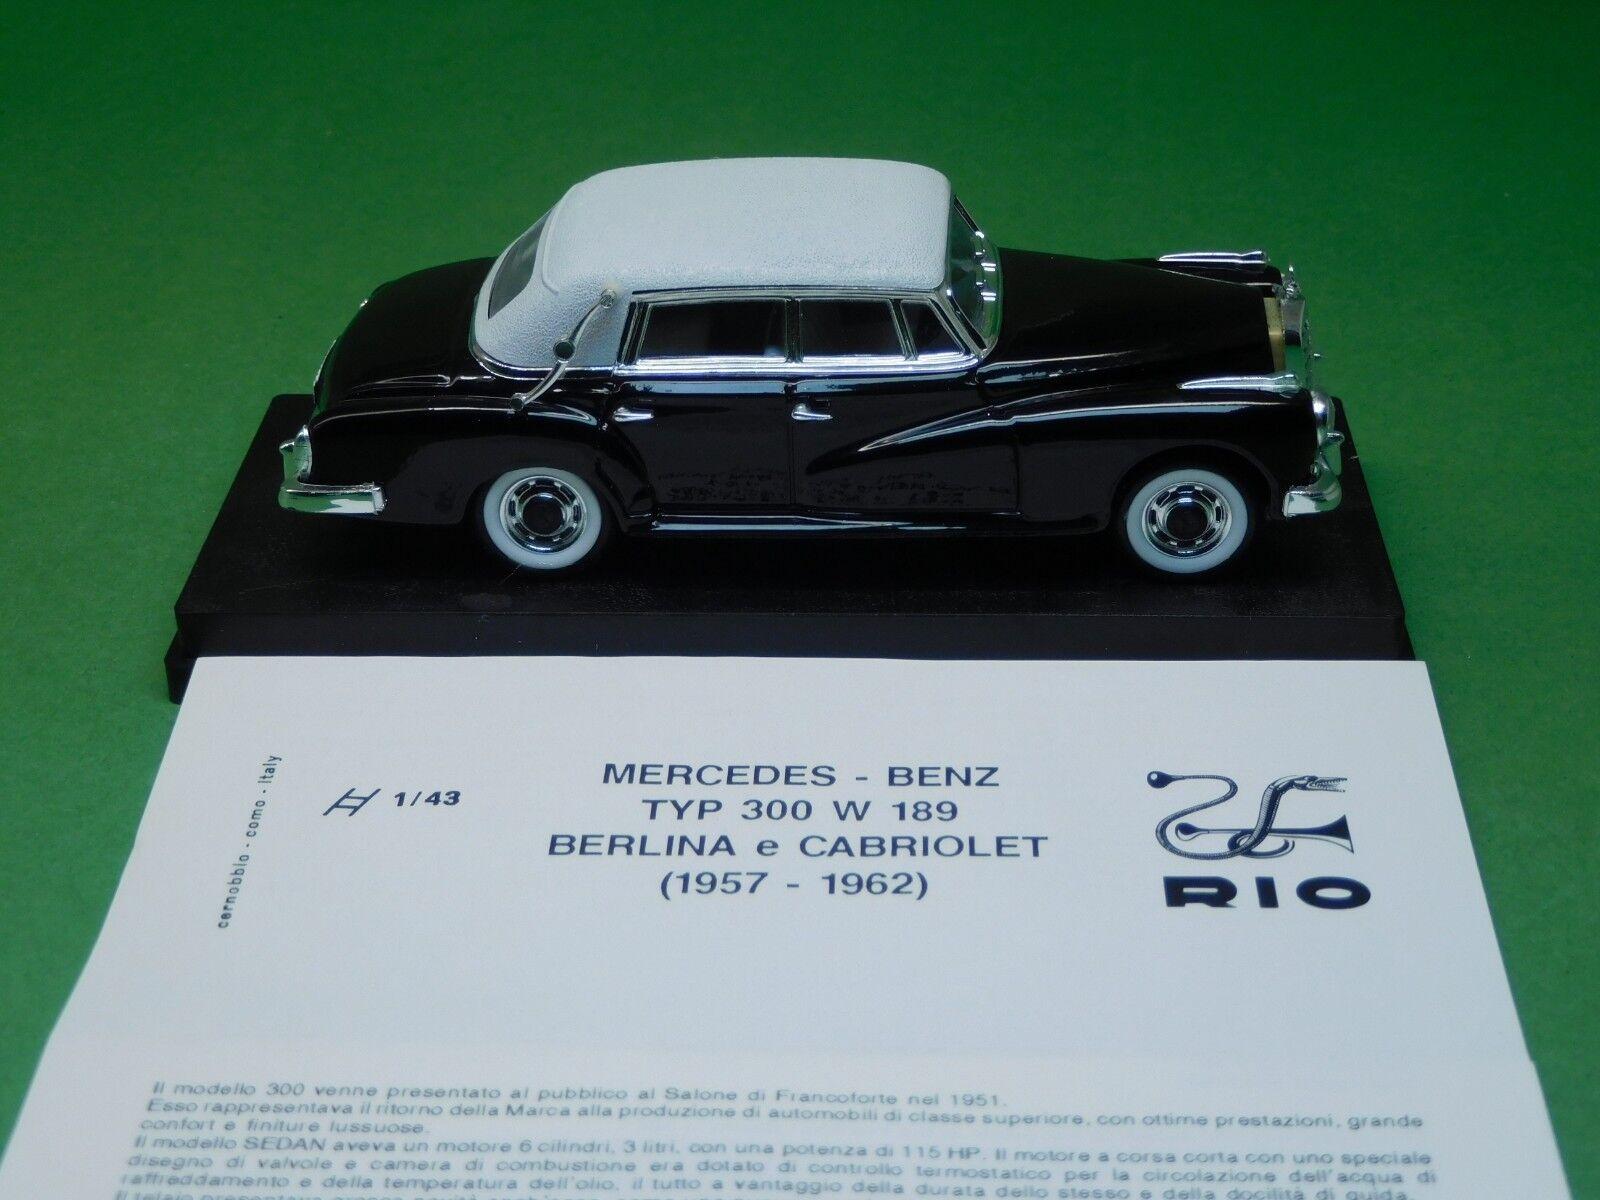 MB Mercedes Benz 300 300 300 d cabriolet 1958 Rio 1 43 N°101 Modellfahrzeug OVP NEU 6e412c